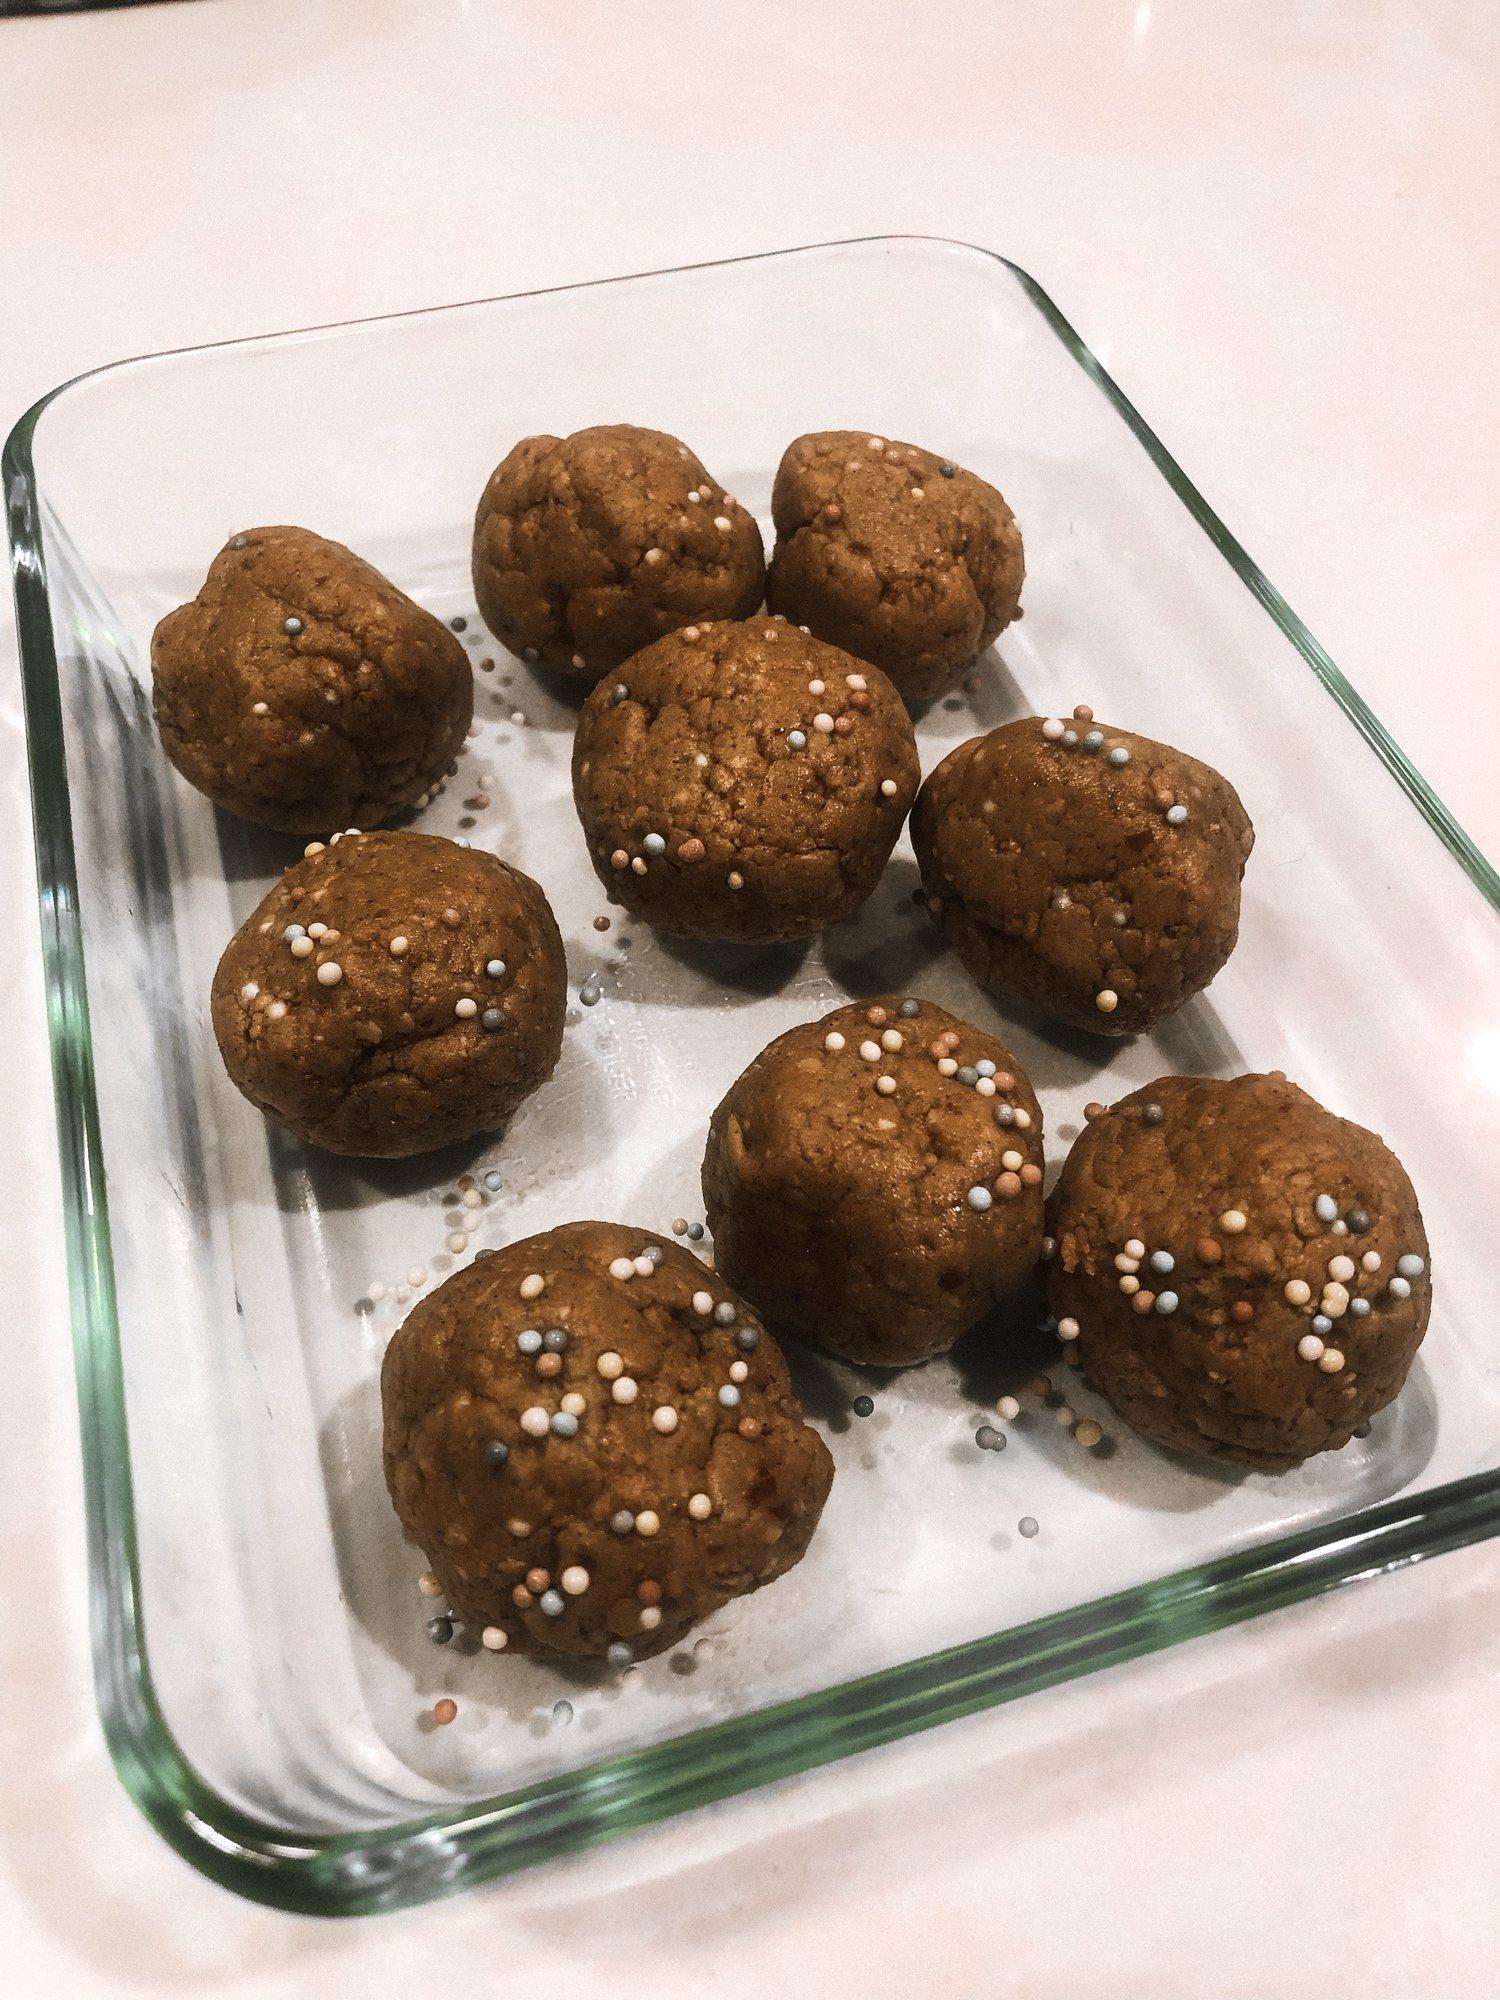 Easy vegan meal prep ideas